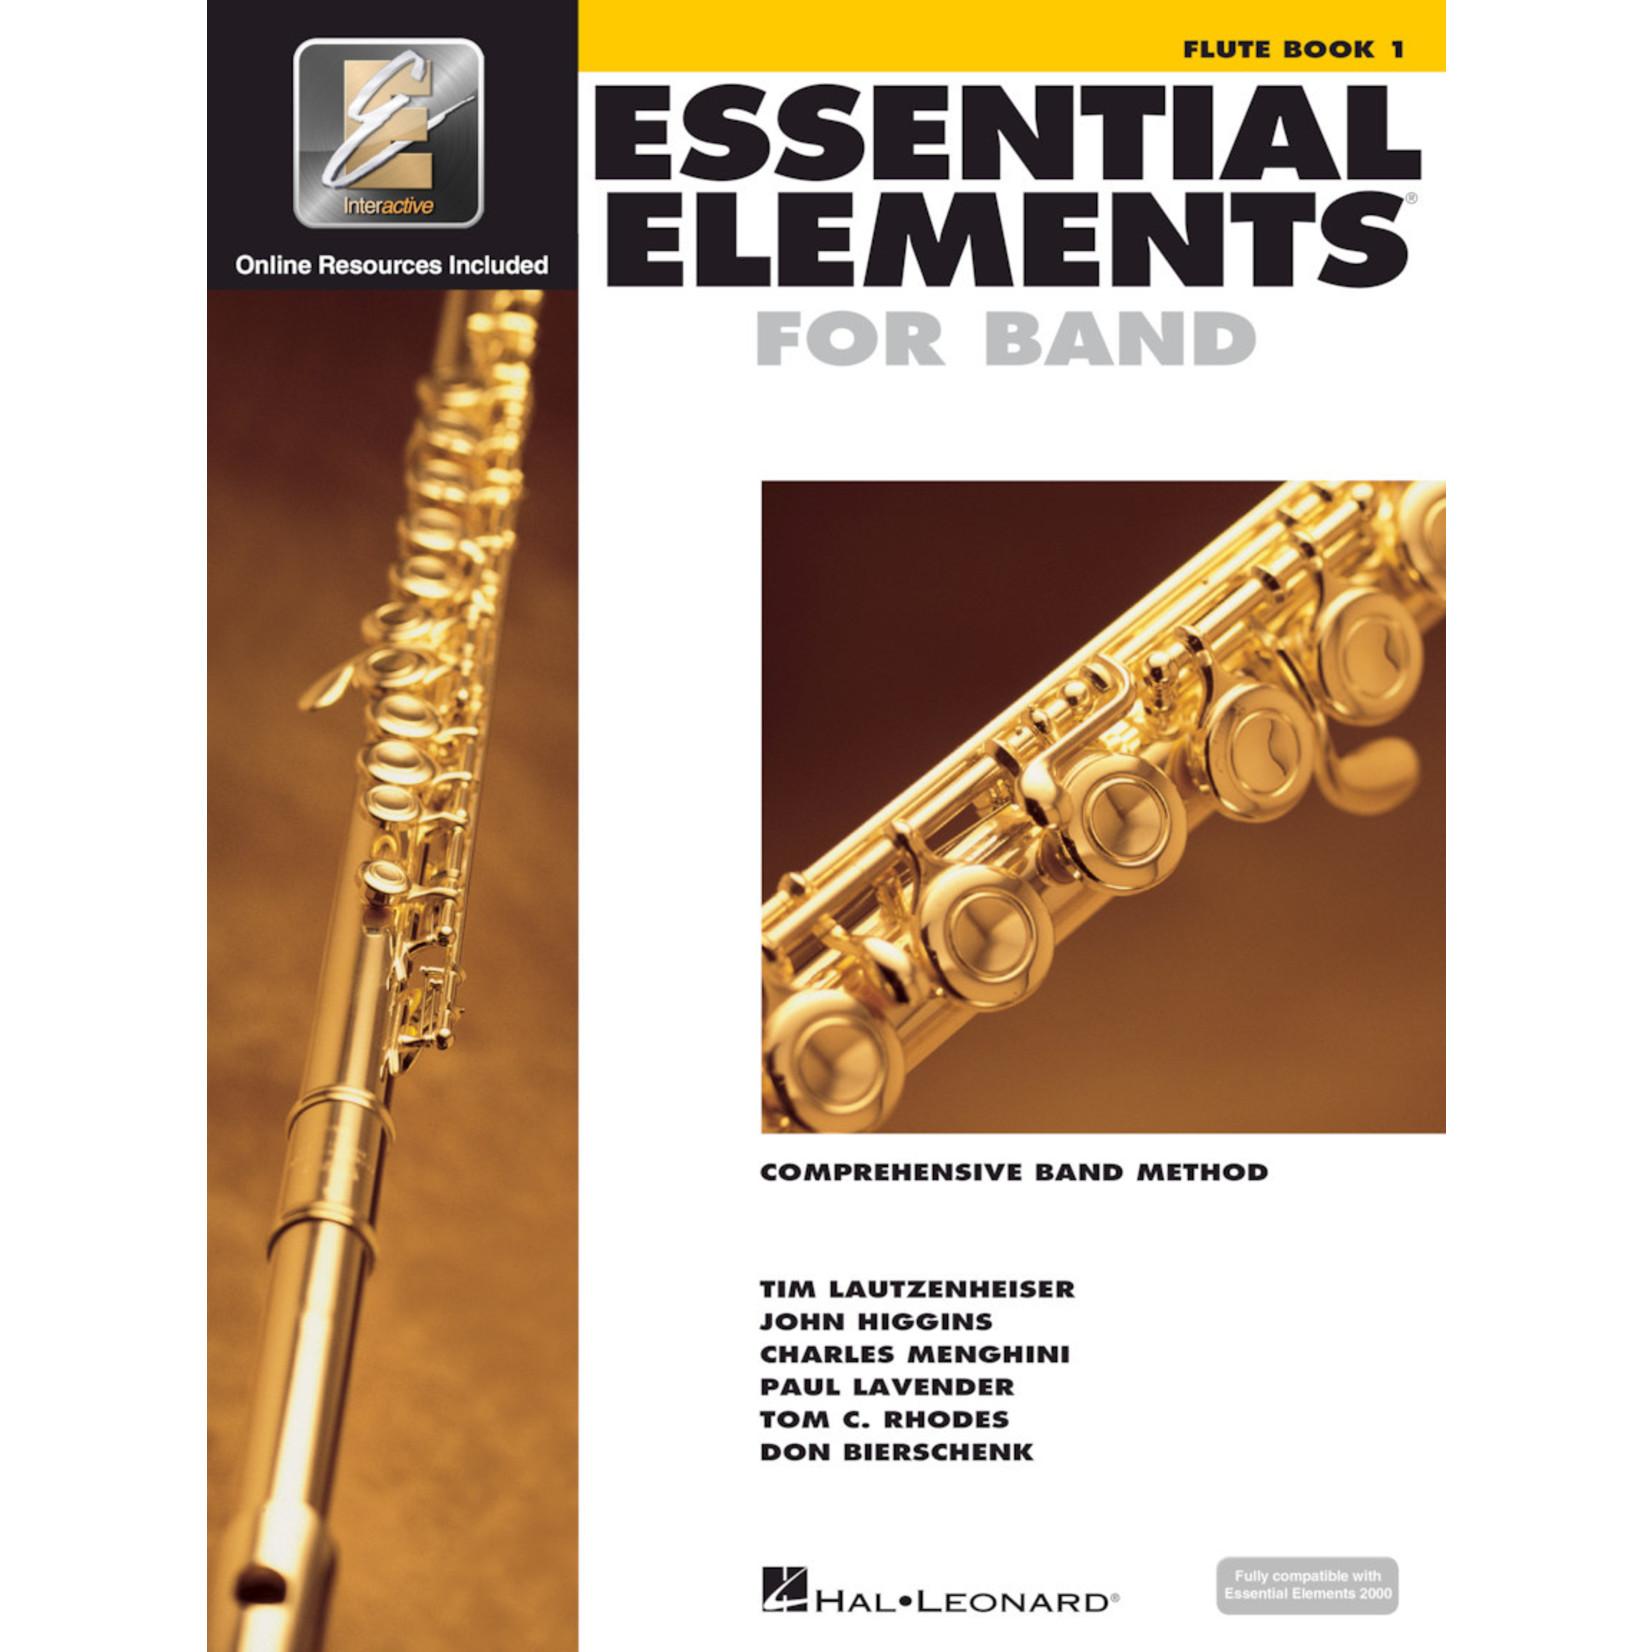 Hal Leonard Essential Elements for Band Flute Book 1